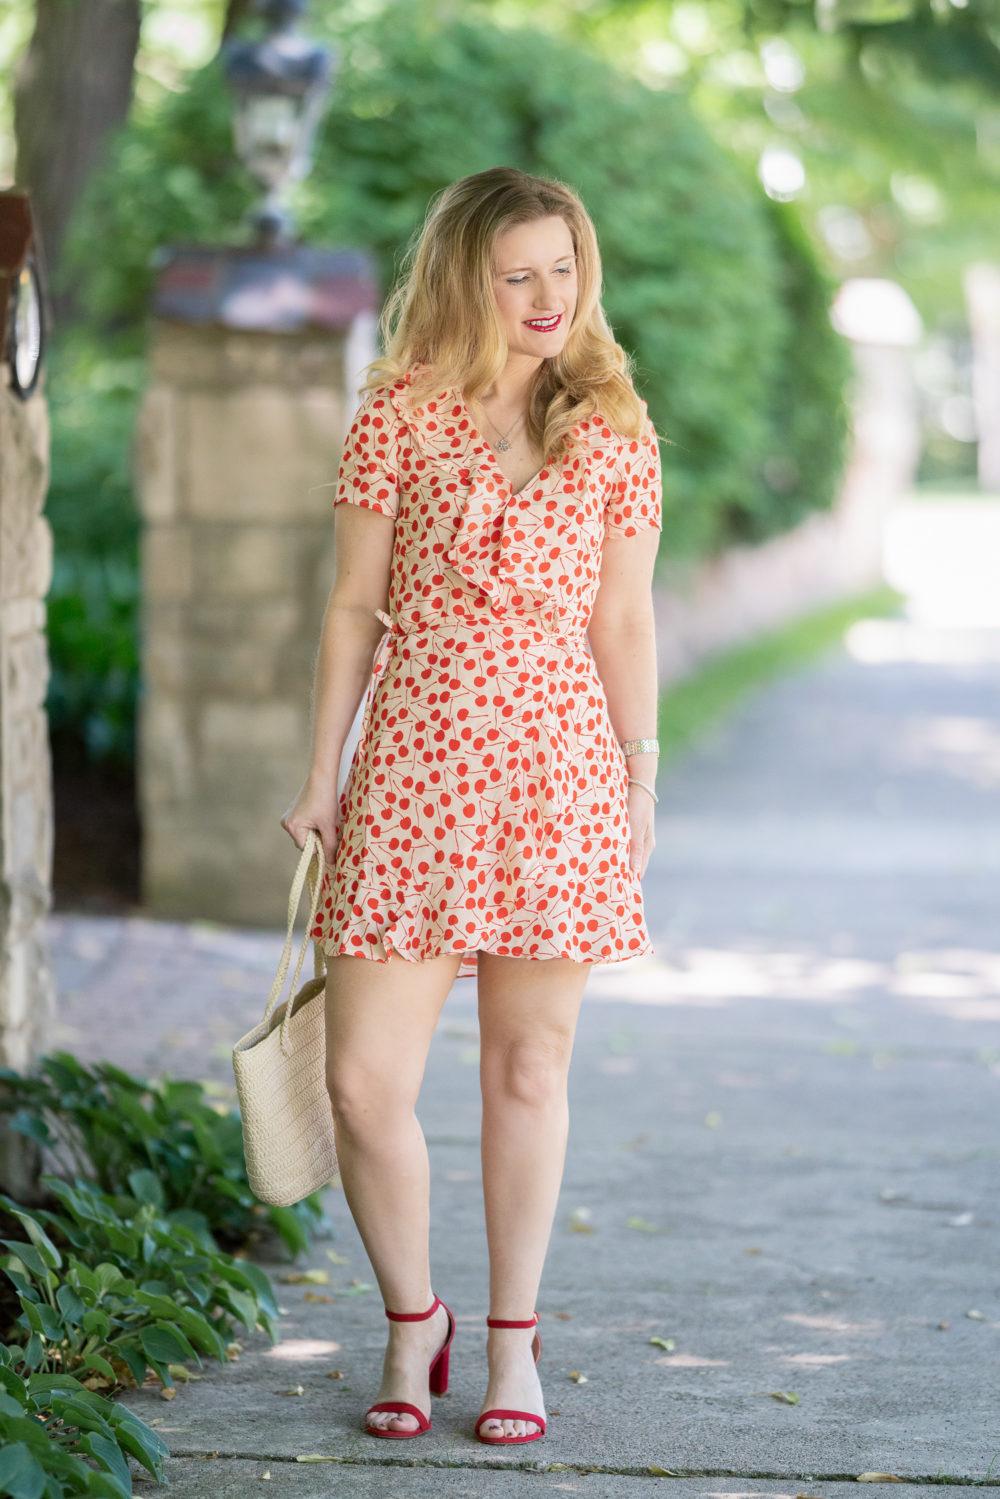 Petite Fashion Blog | Beach Riot Cherry Dress | Topshop Fruity Cherry Straw Tote Bag | Stuart Weitzman sandals